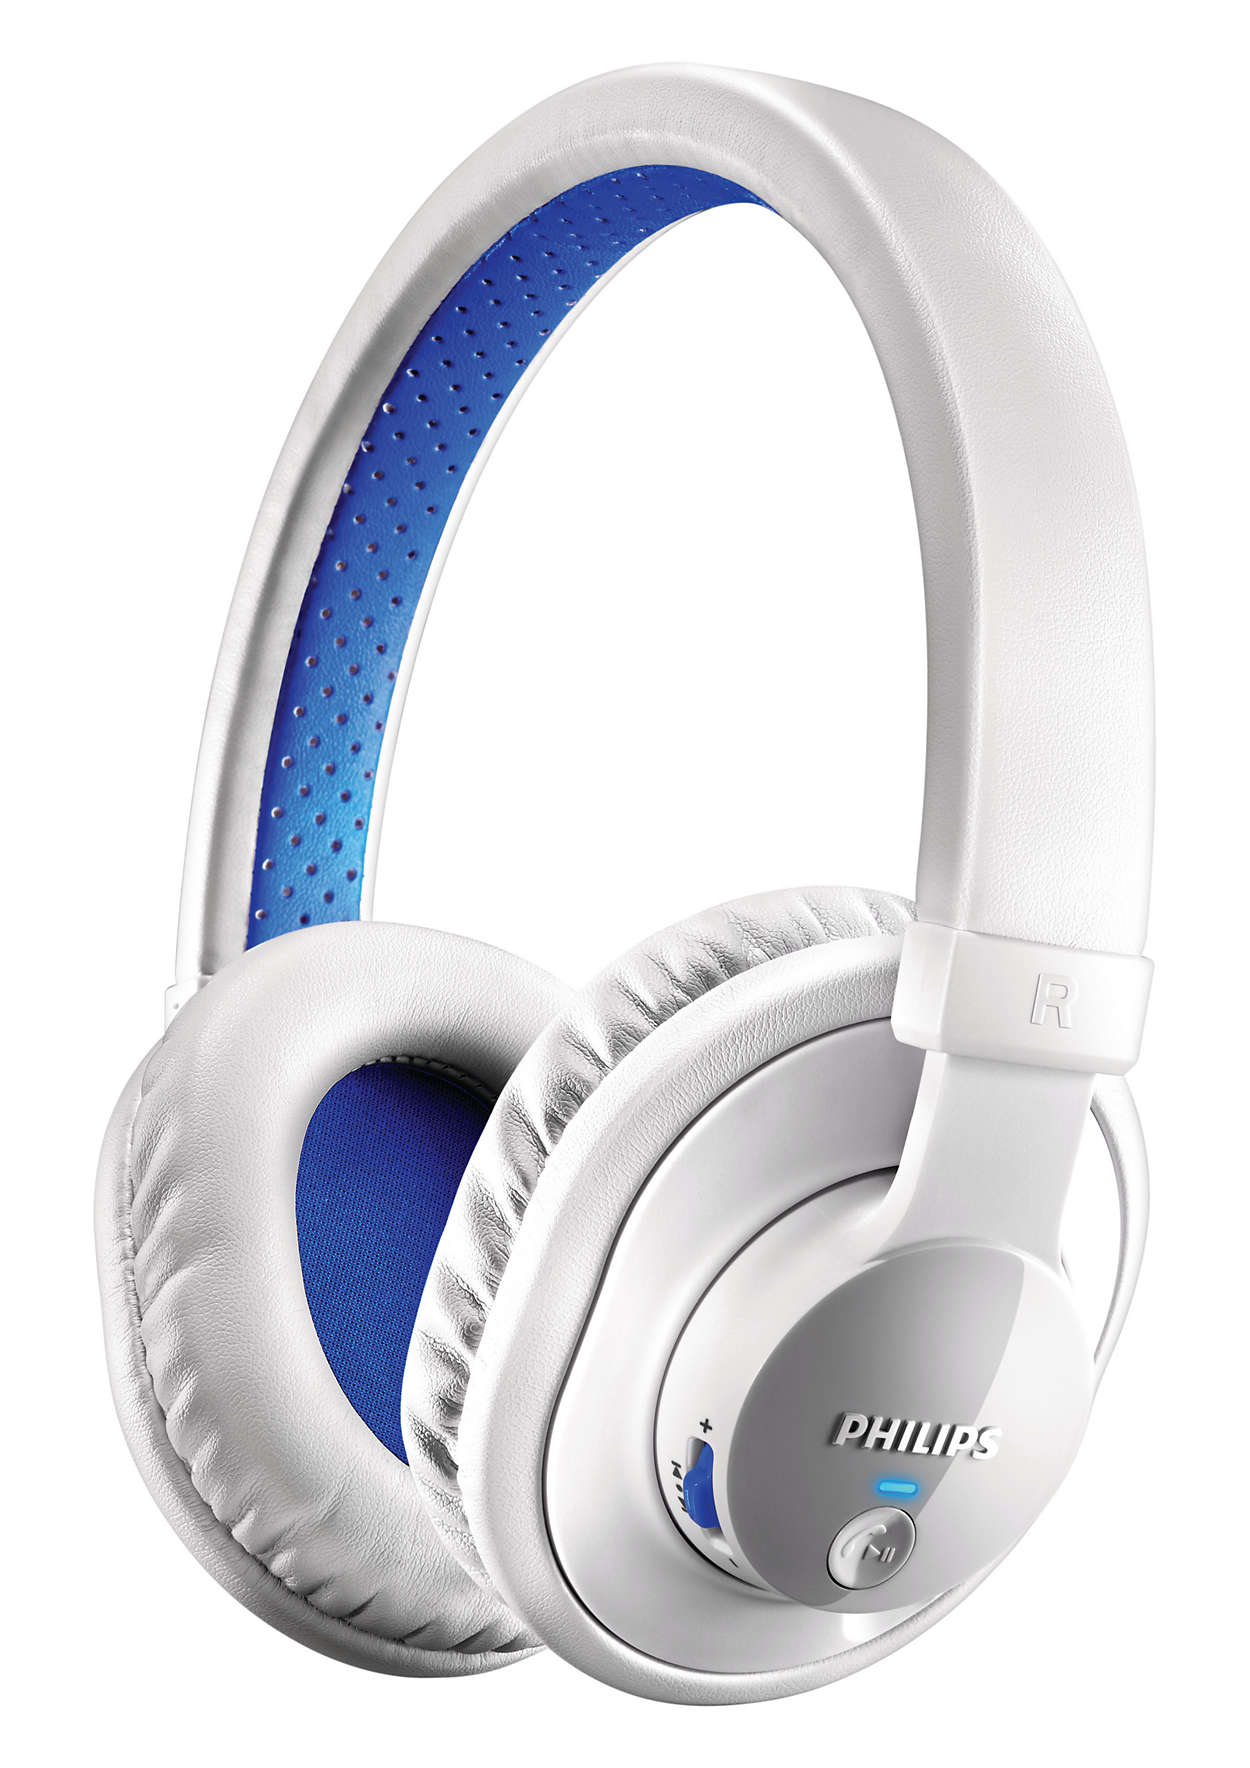 Bluetooth Stereo Headset Shb7000wt 00 Philips